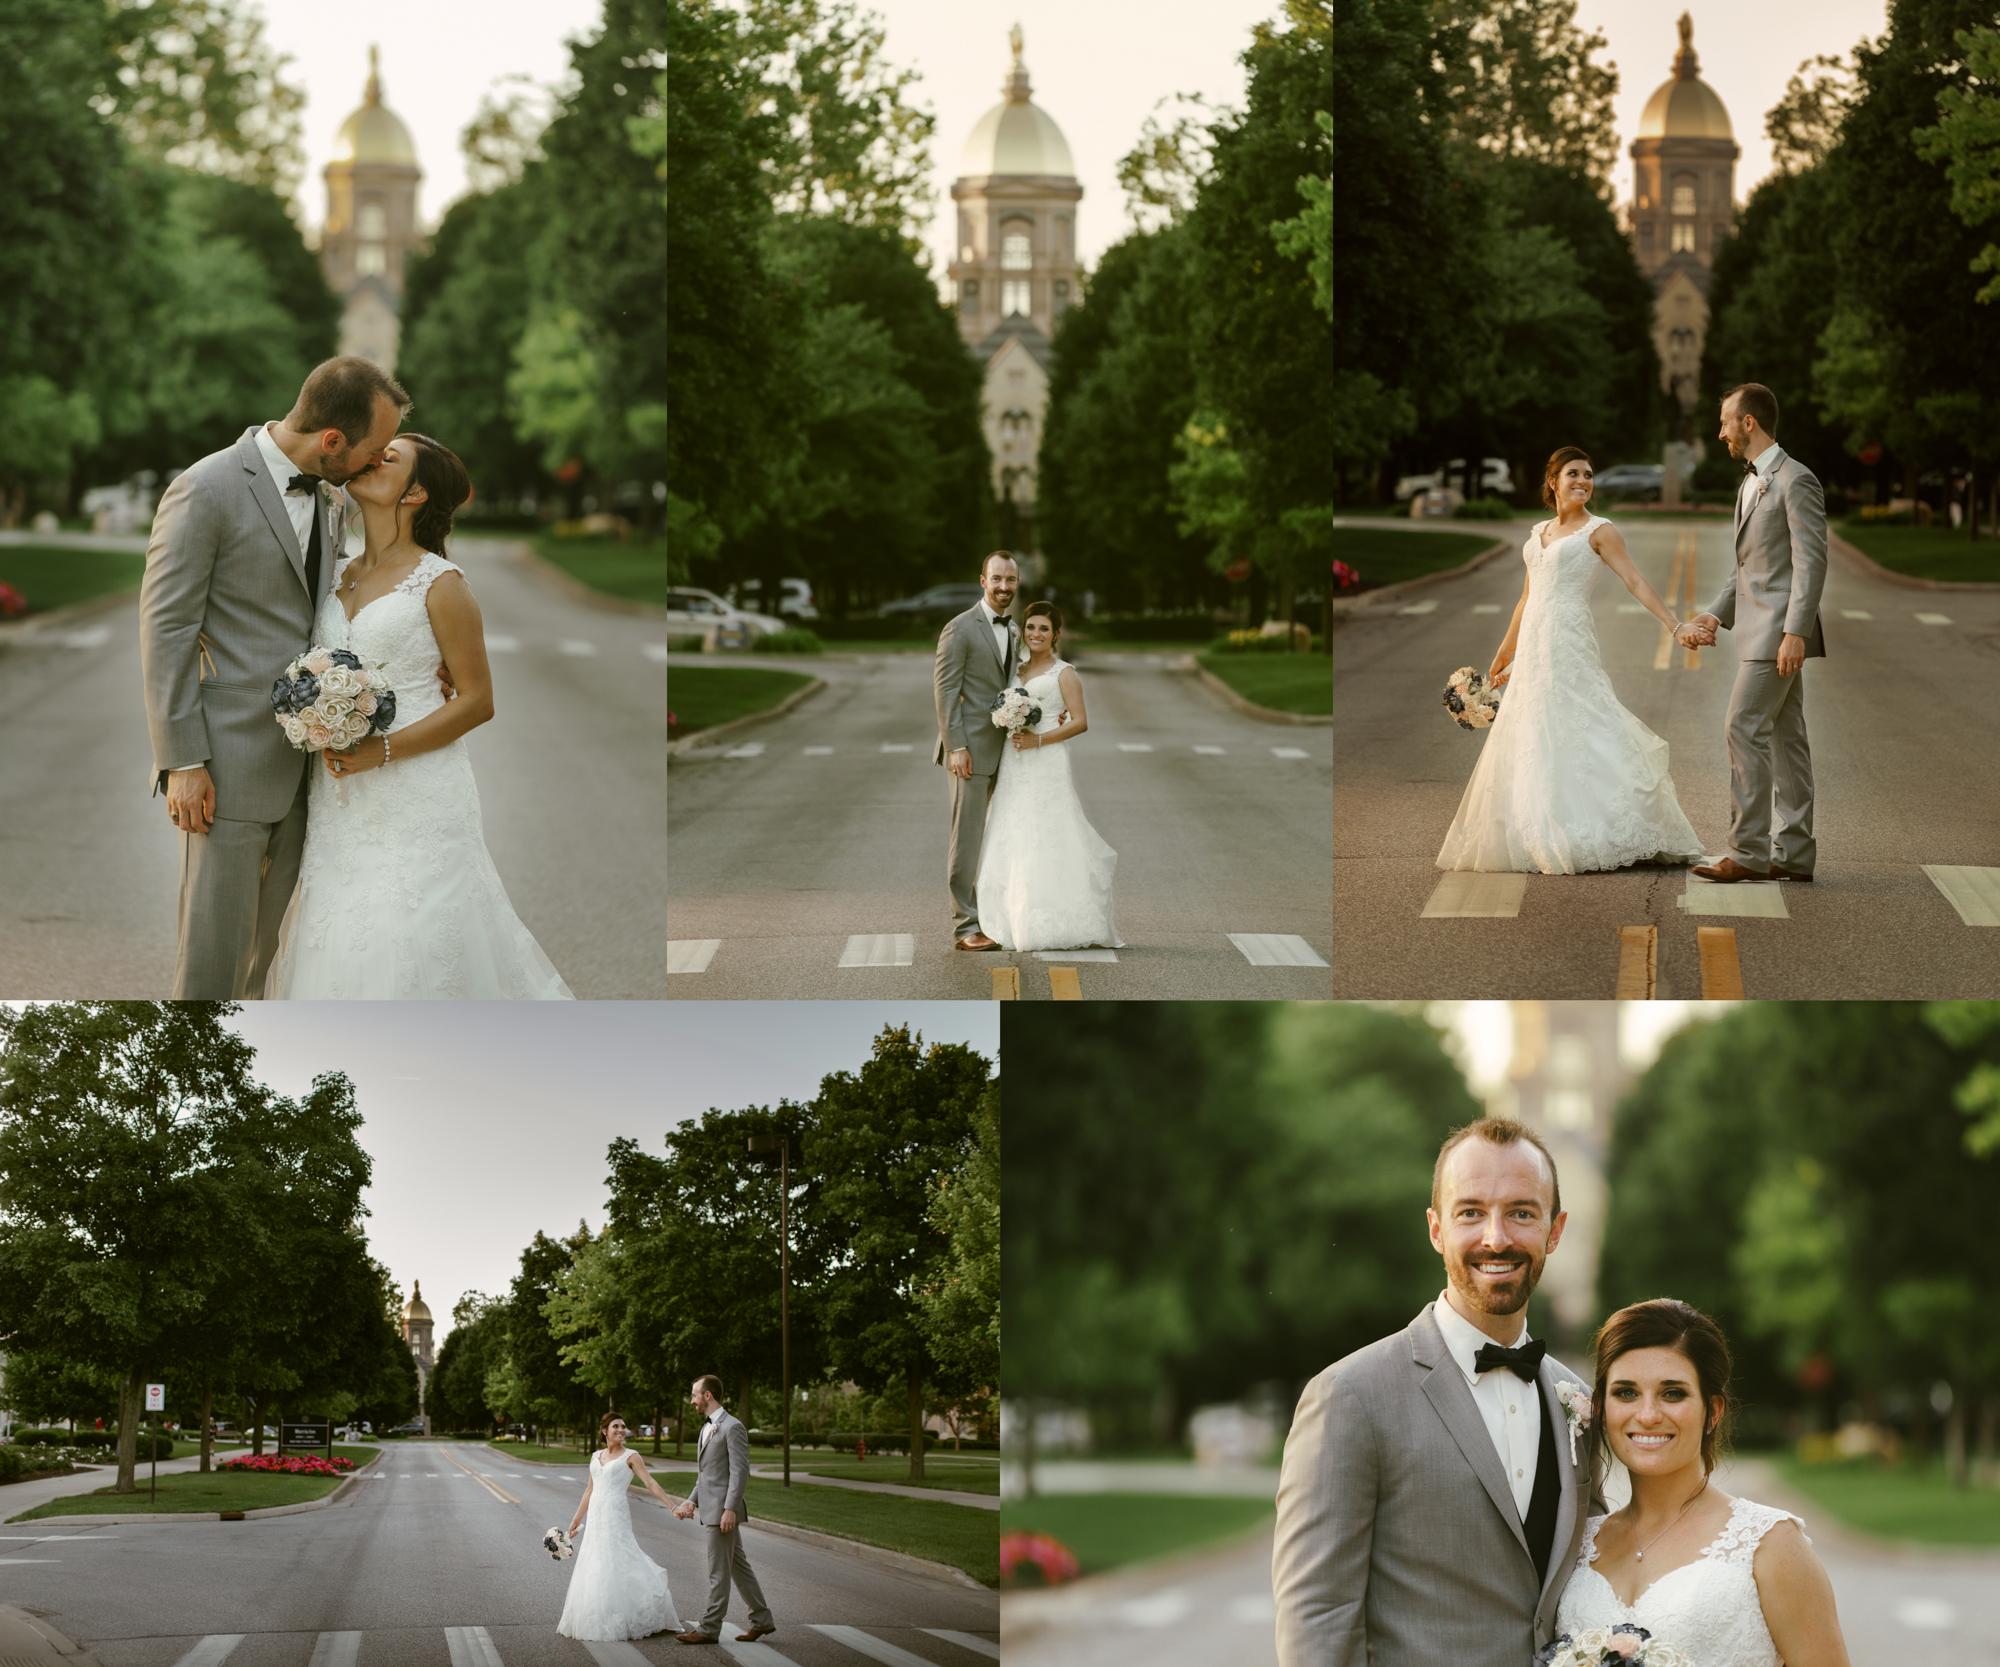 035 kaitlyn-colin-notre-dame-wedding.jpg